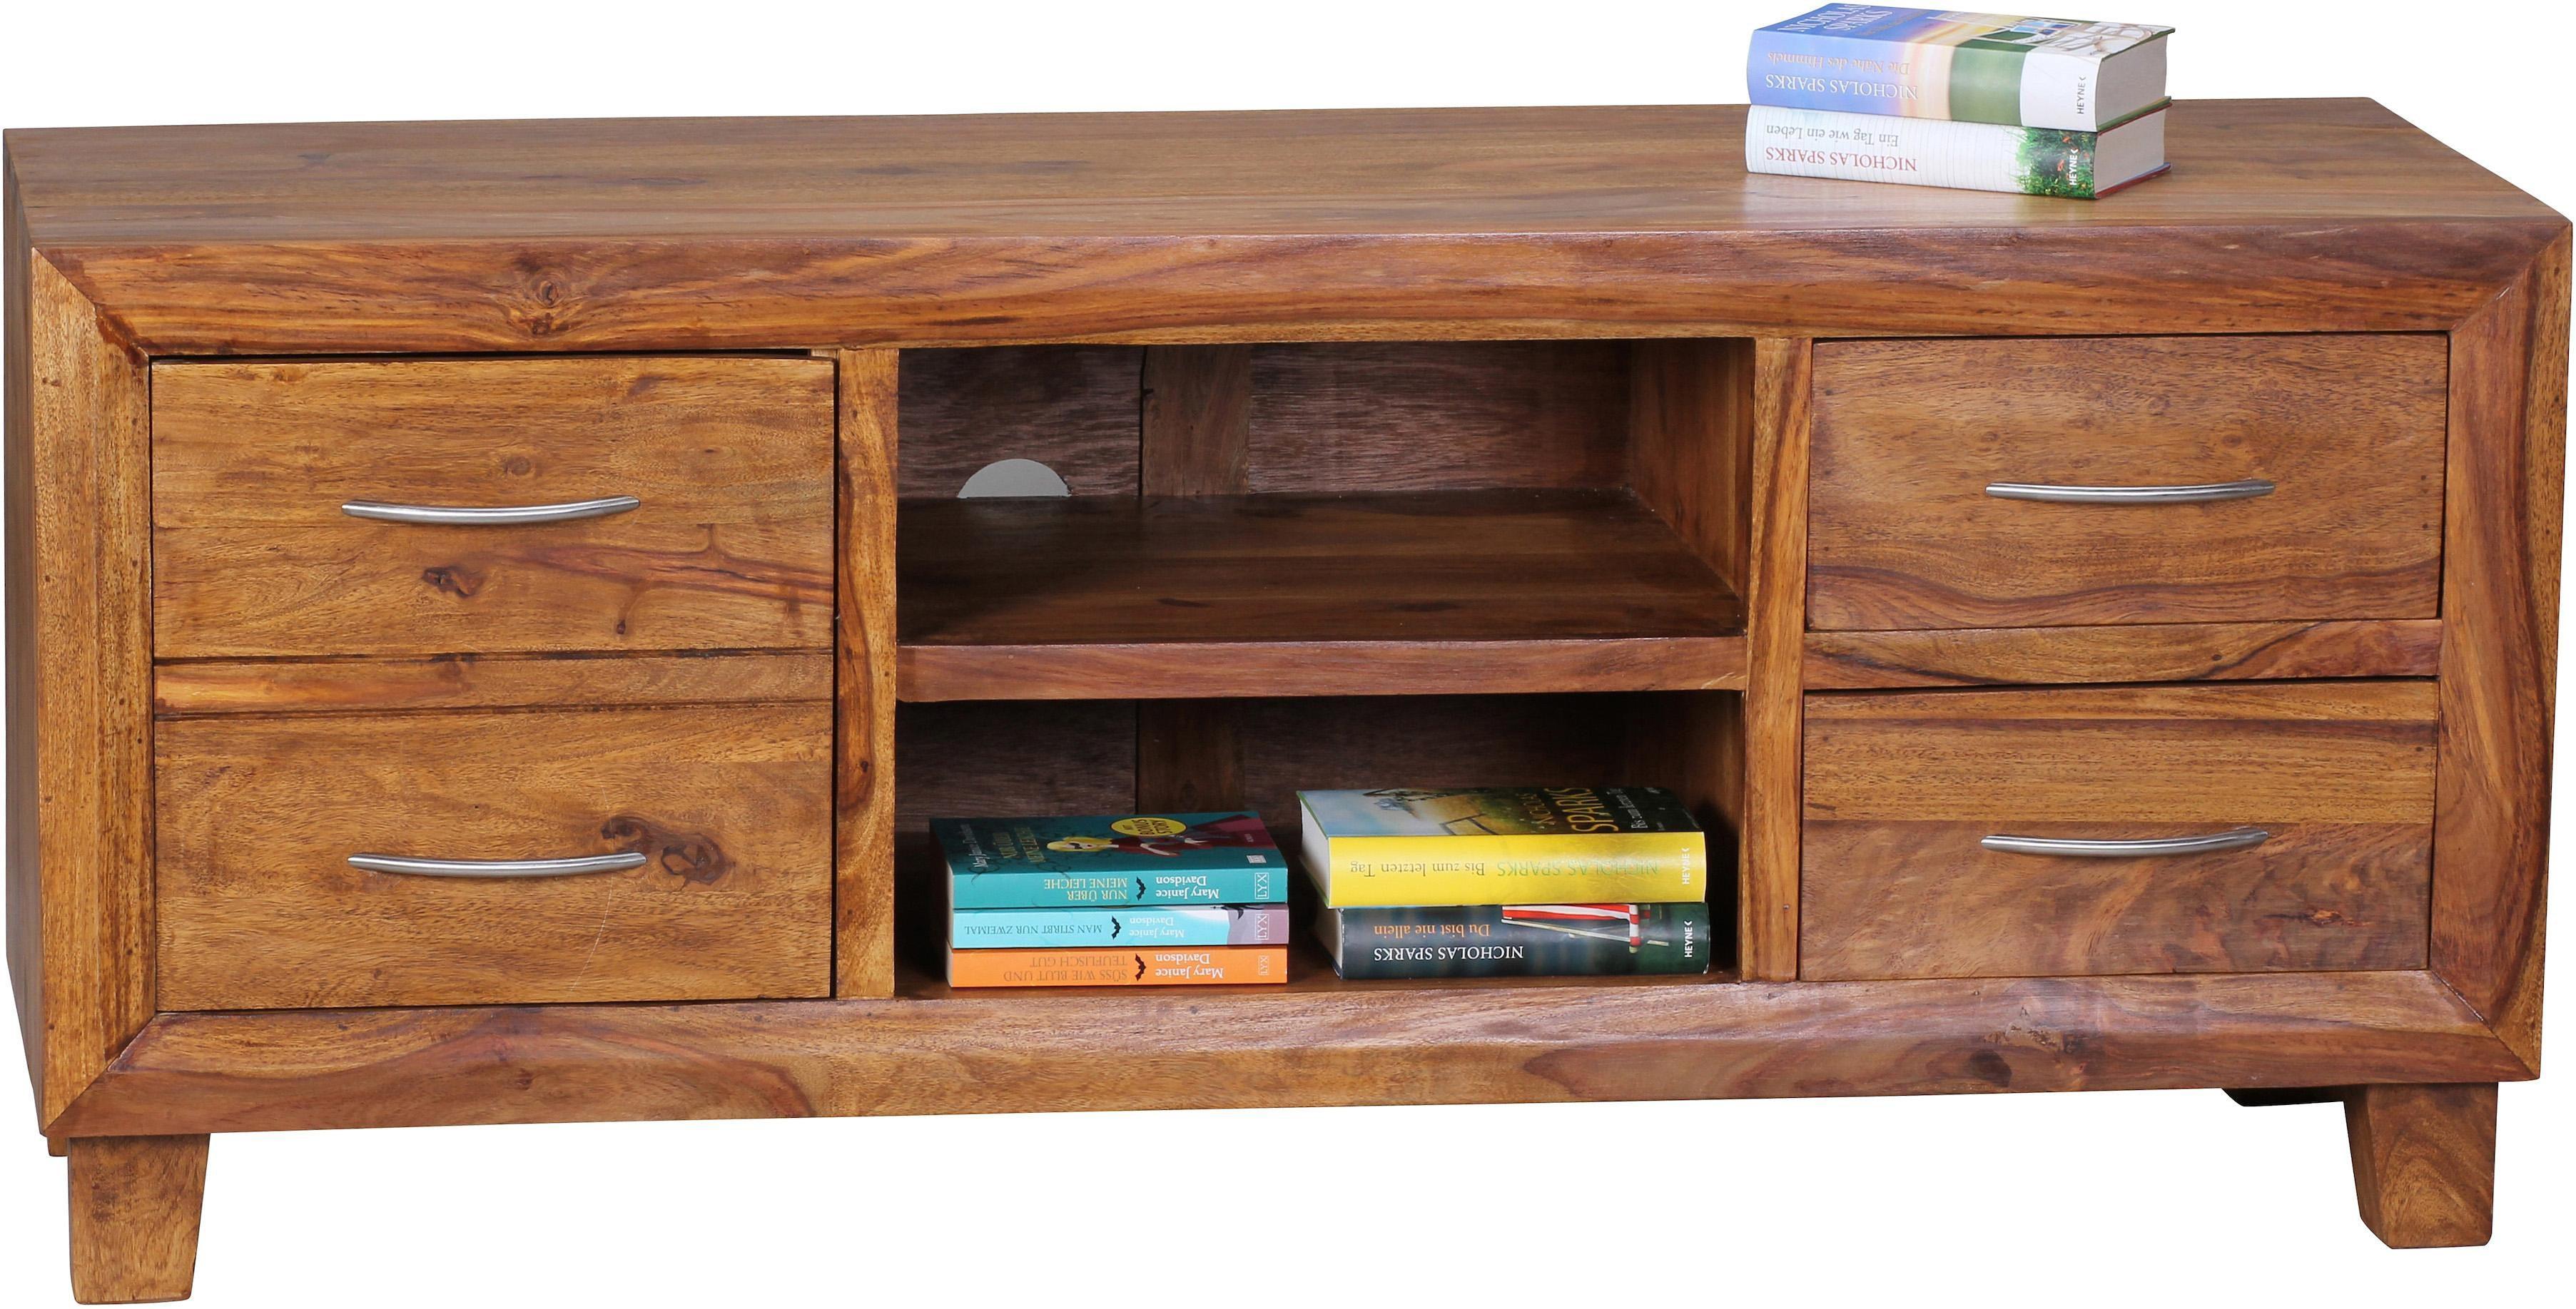 Home affaire Lowboard »Malati« 135 cm aus massivem Sheeshamholz